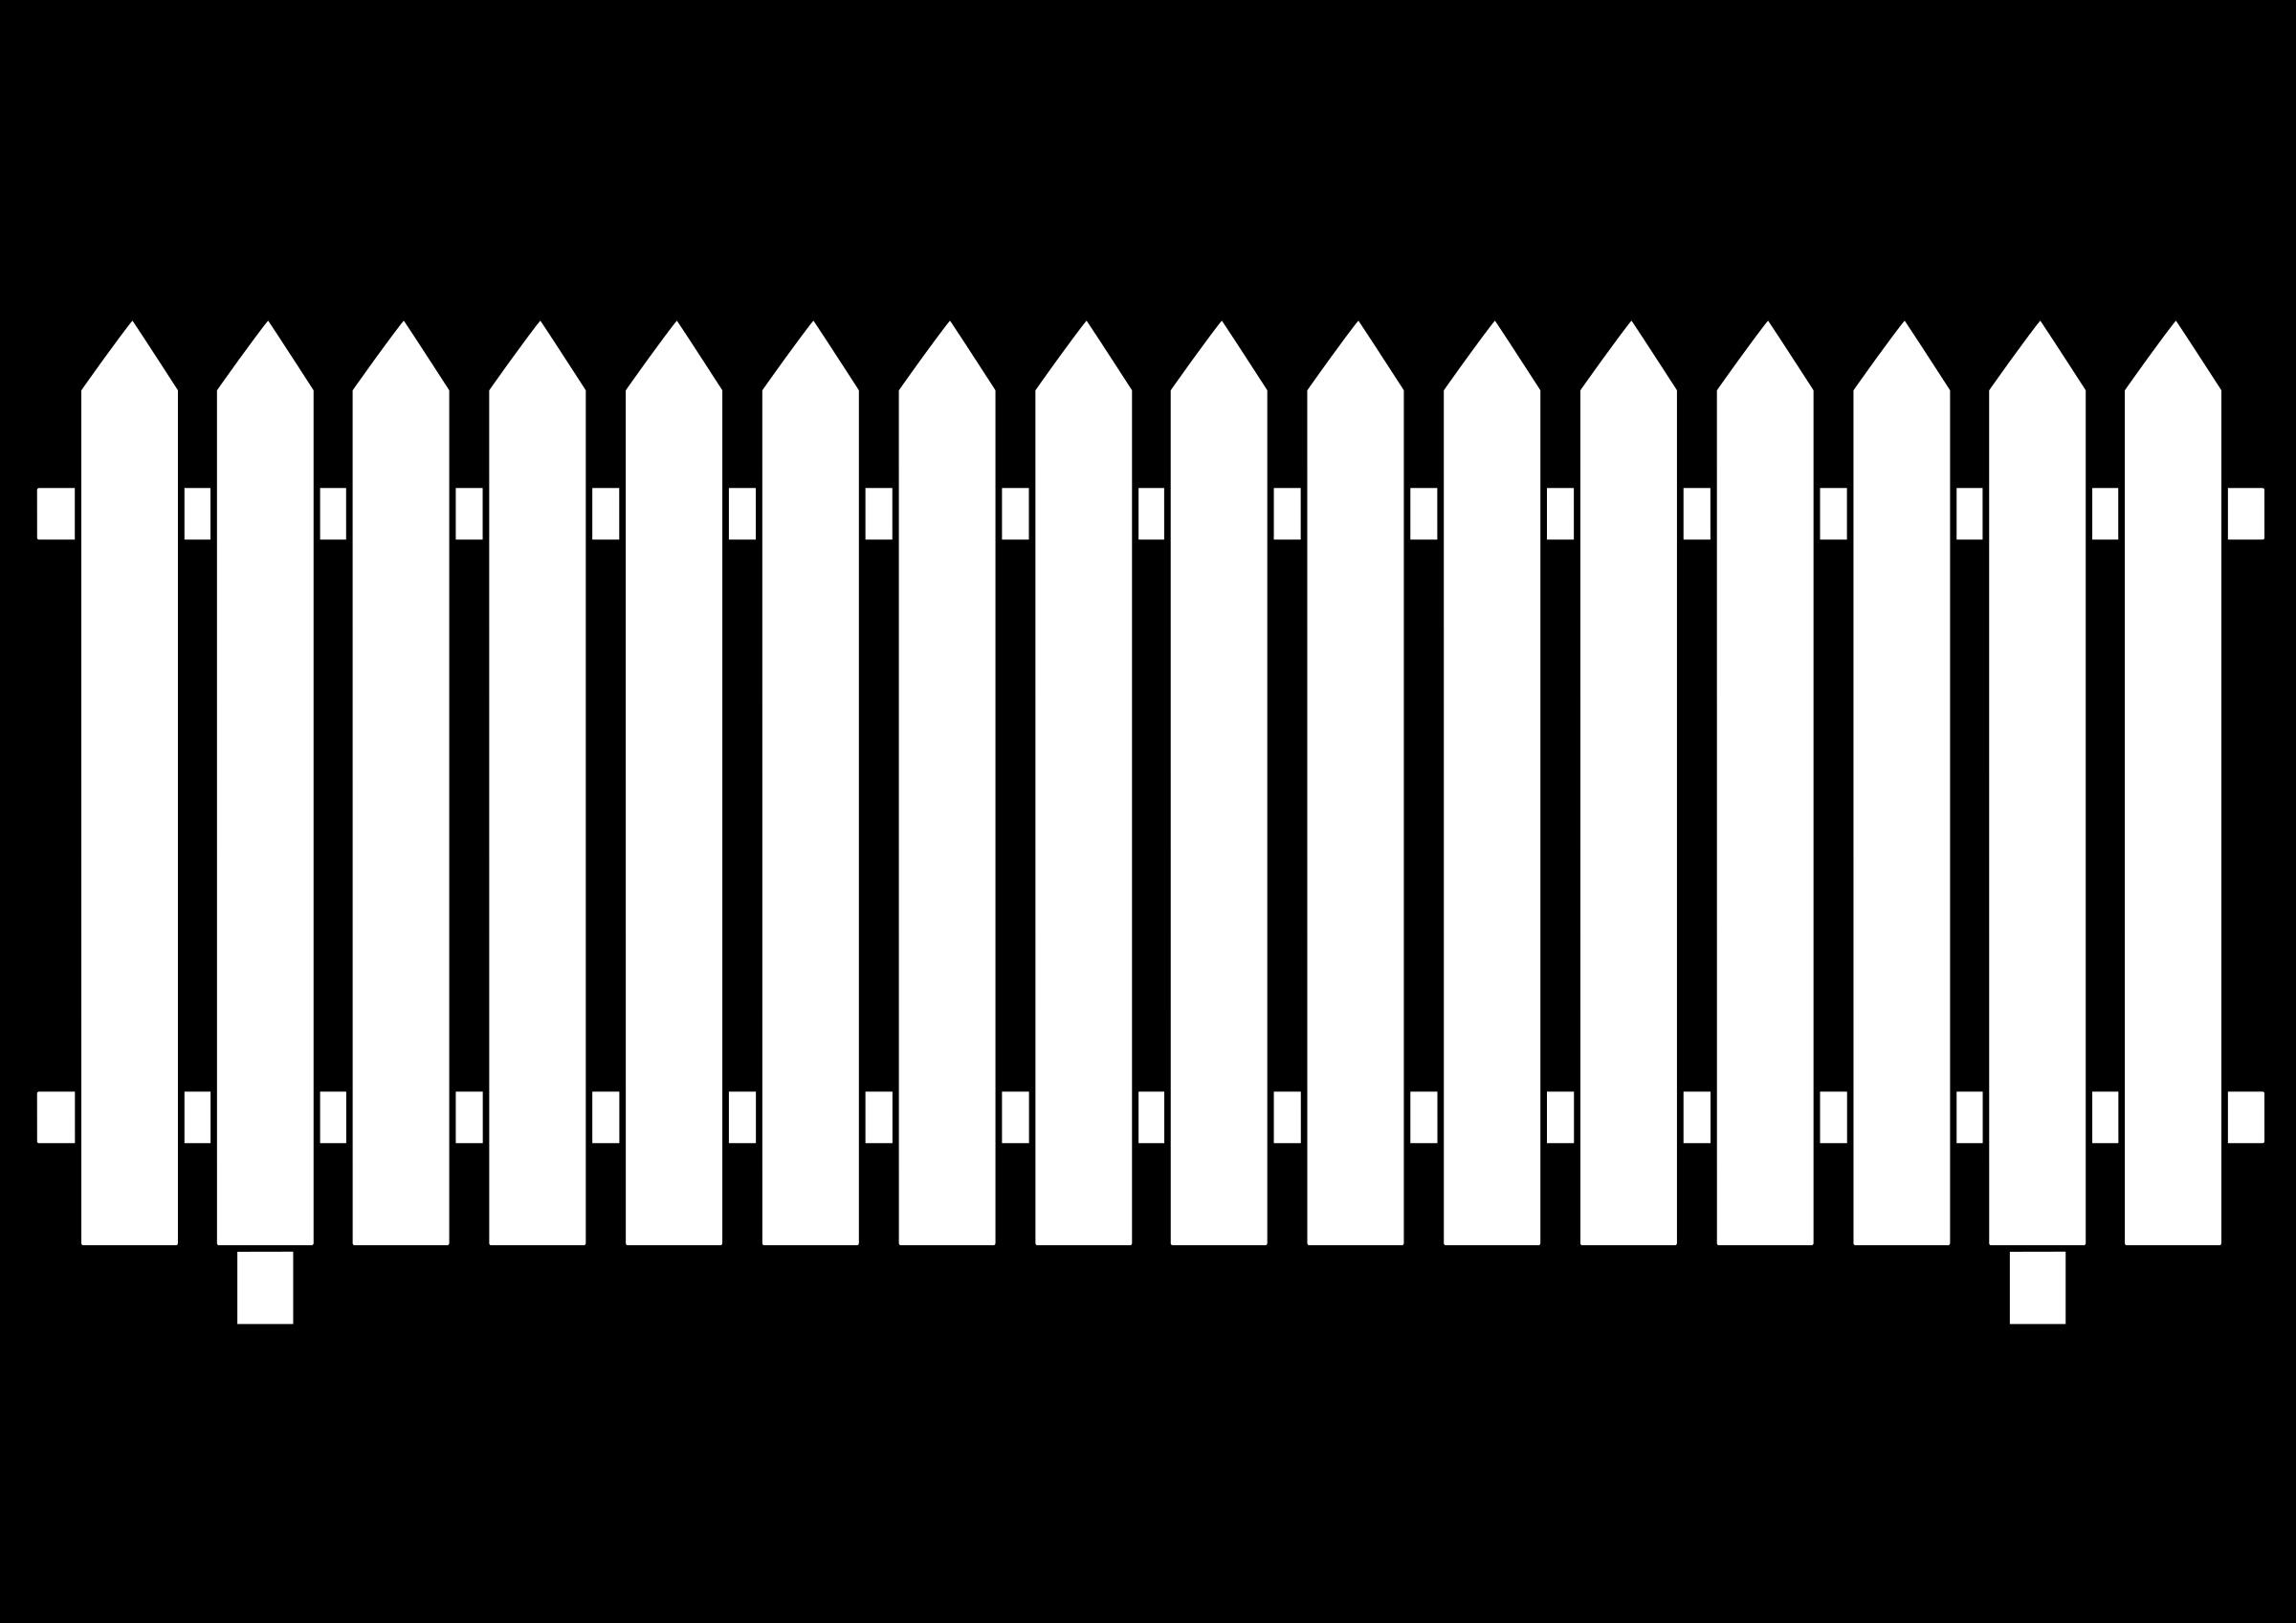 White picket fence house clipart jpg transparent download 28+ Collection of White Picket Fence Clipart | High quality, free ... jpg transparent download